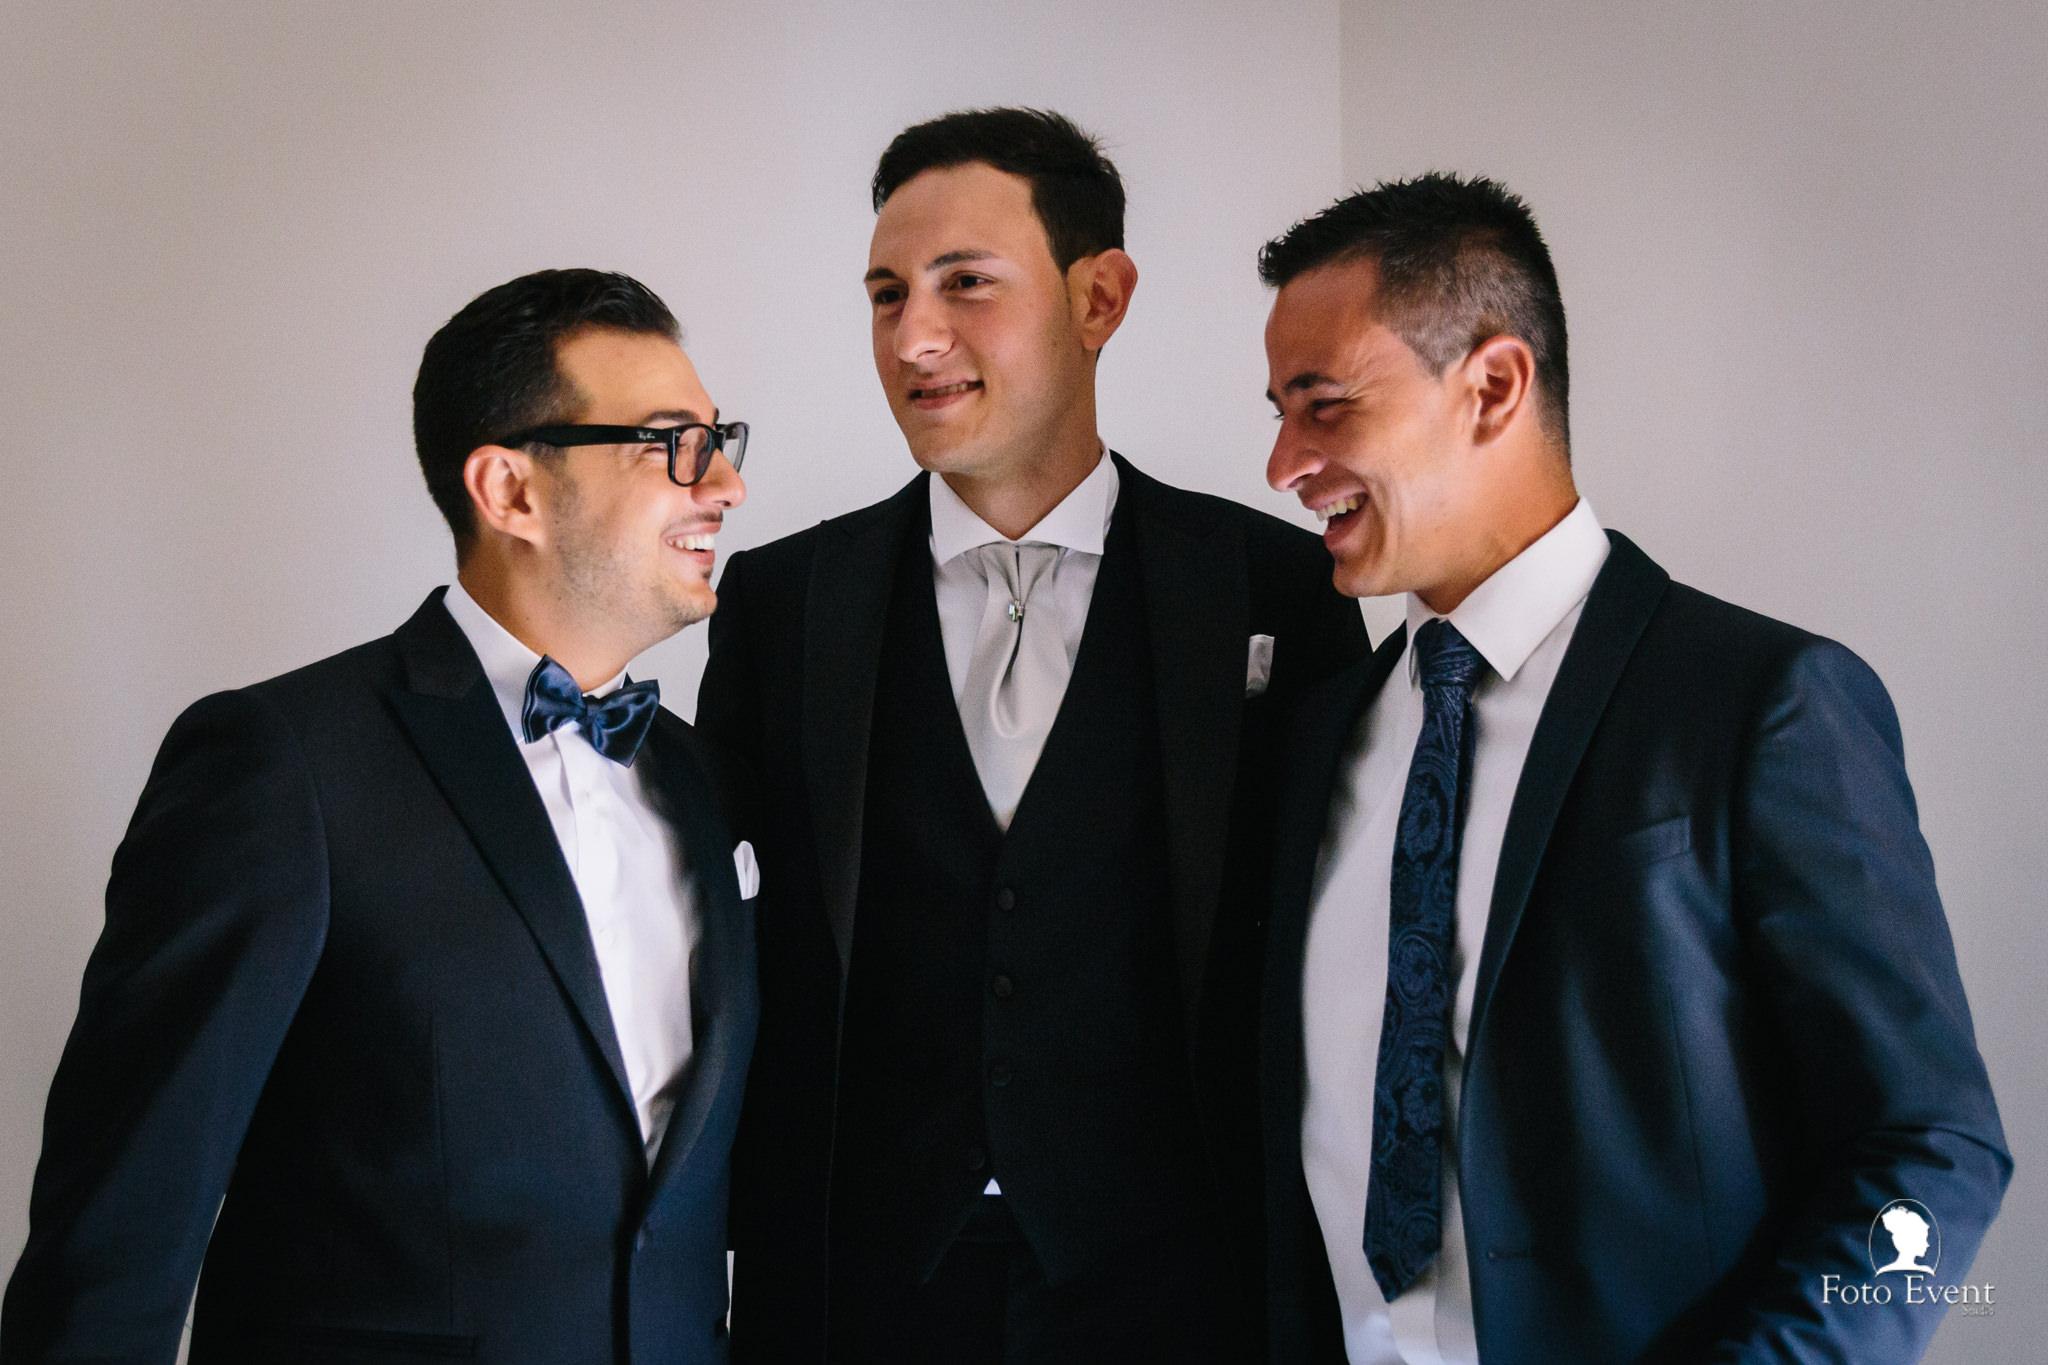 003-2019-08-23-Matrimonio-Lucia-e-Rosario-Scopelliti-5DE-224